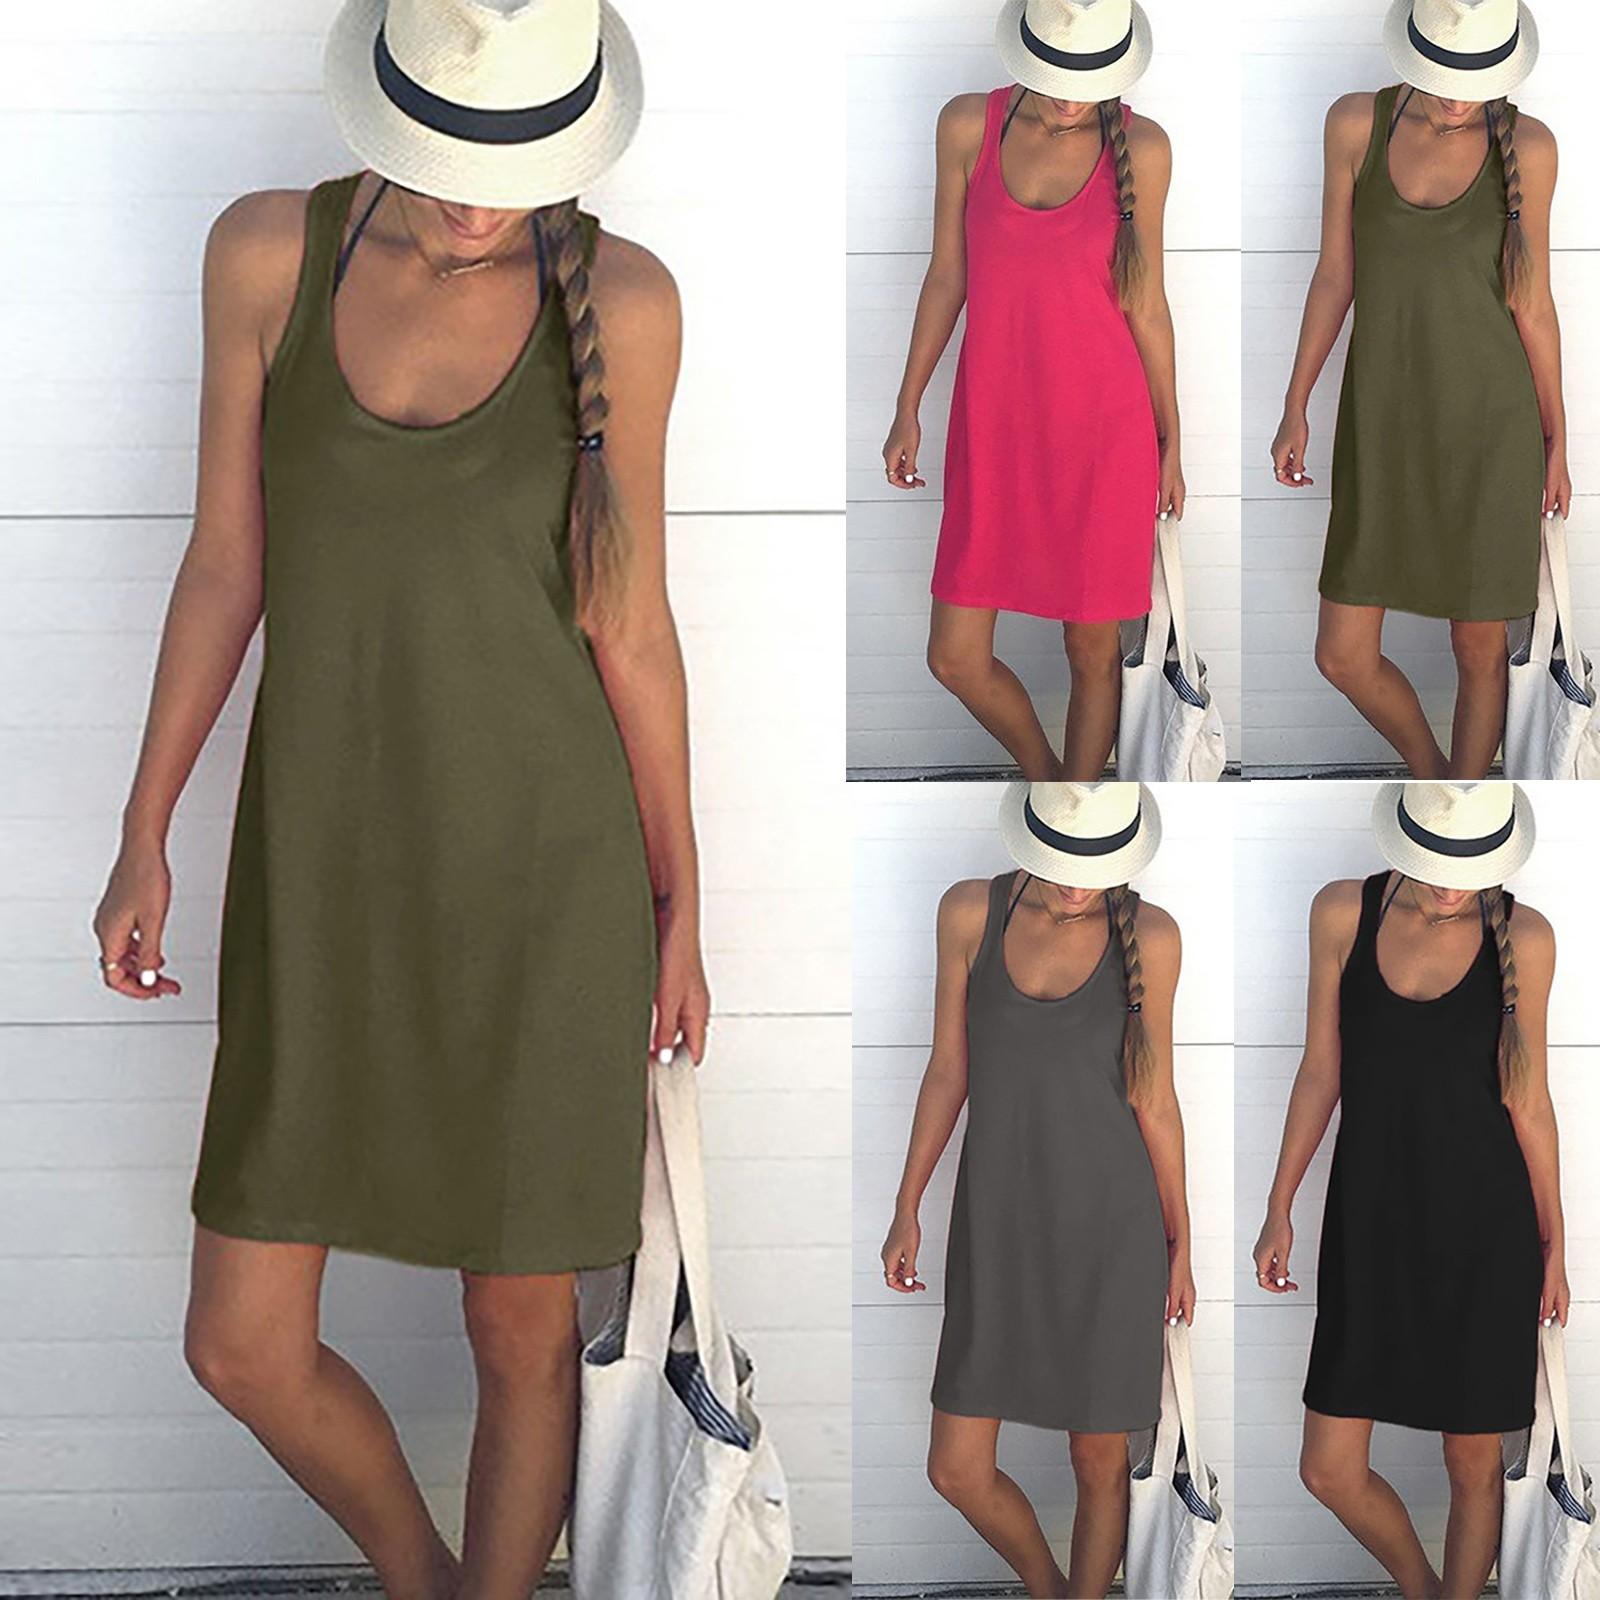 Summer Slim Dress Women's Fashion Loose Solid Color Sleeveless Low Collar Casual Vest Dress Elegant Solid Dresses Женское Платье